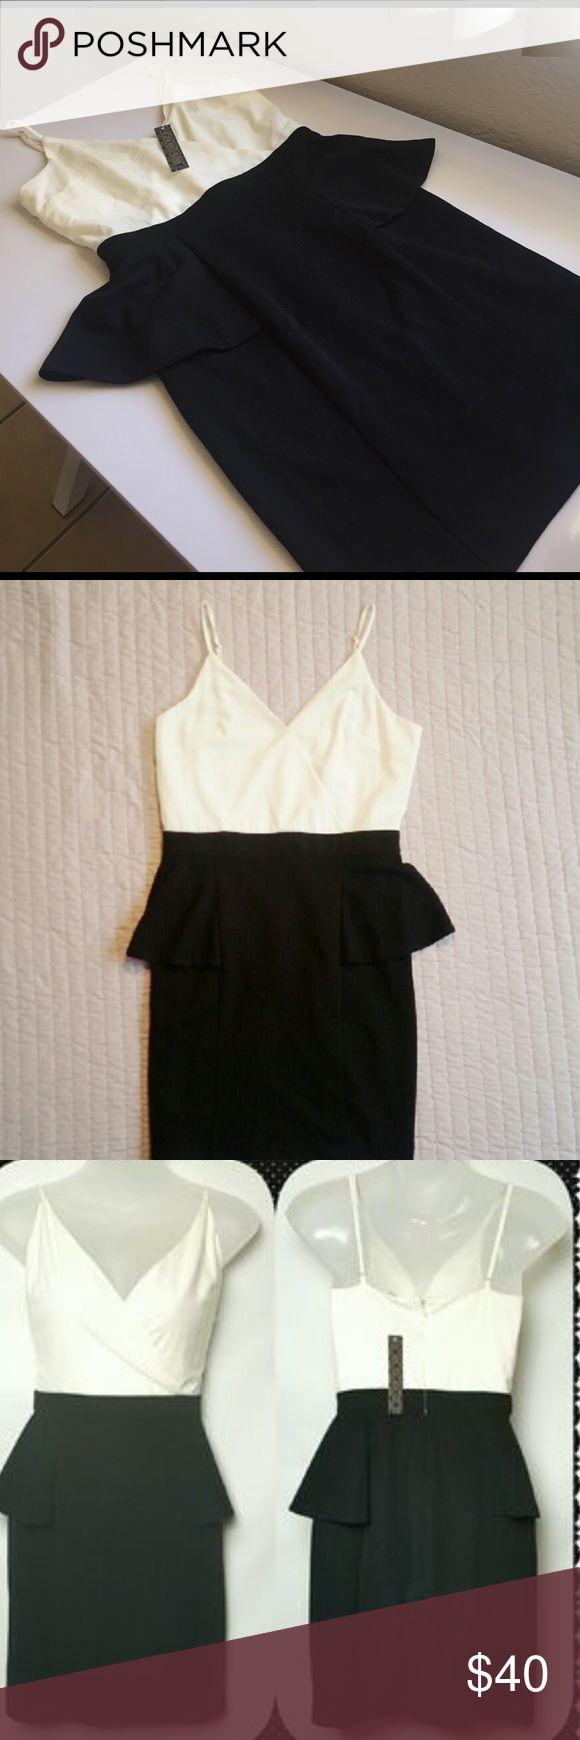 XS Gianni Bini Black & White Peplum Dress Gianni Bini Cream & Black Strap Dress size XS with tags Gianni Bini Dresses Mini